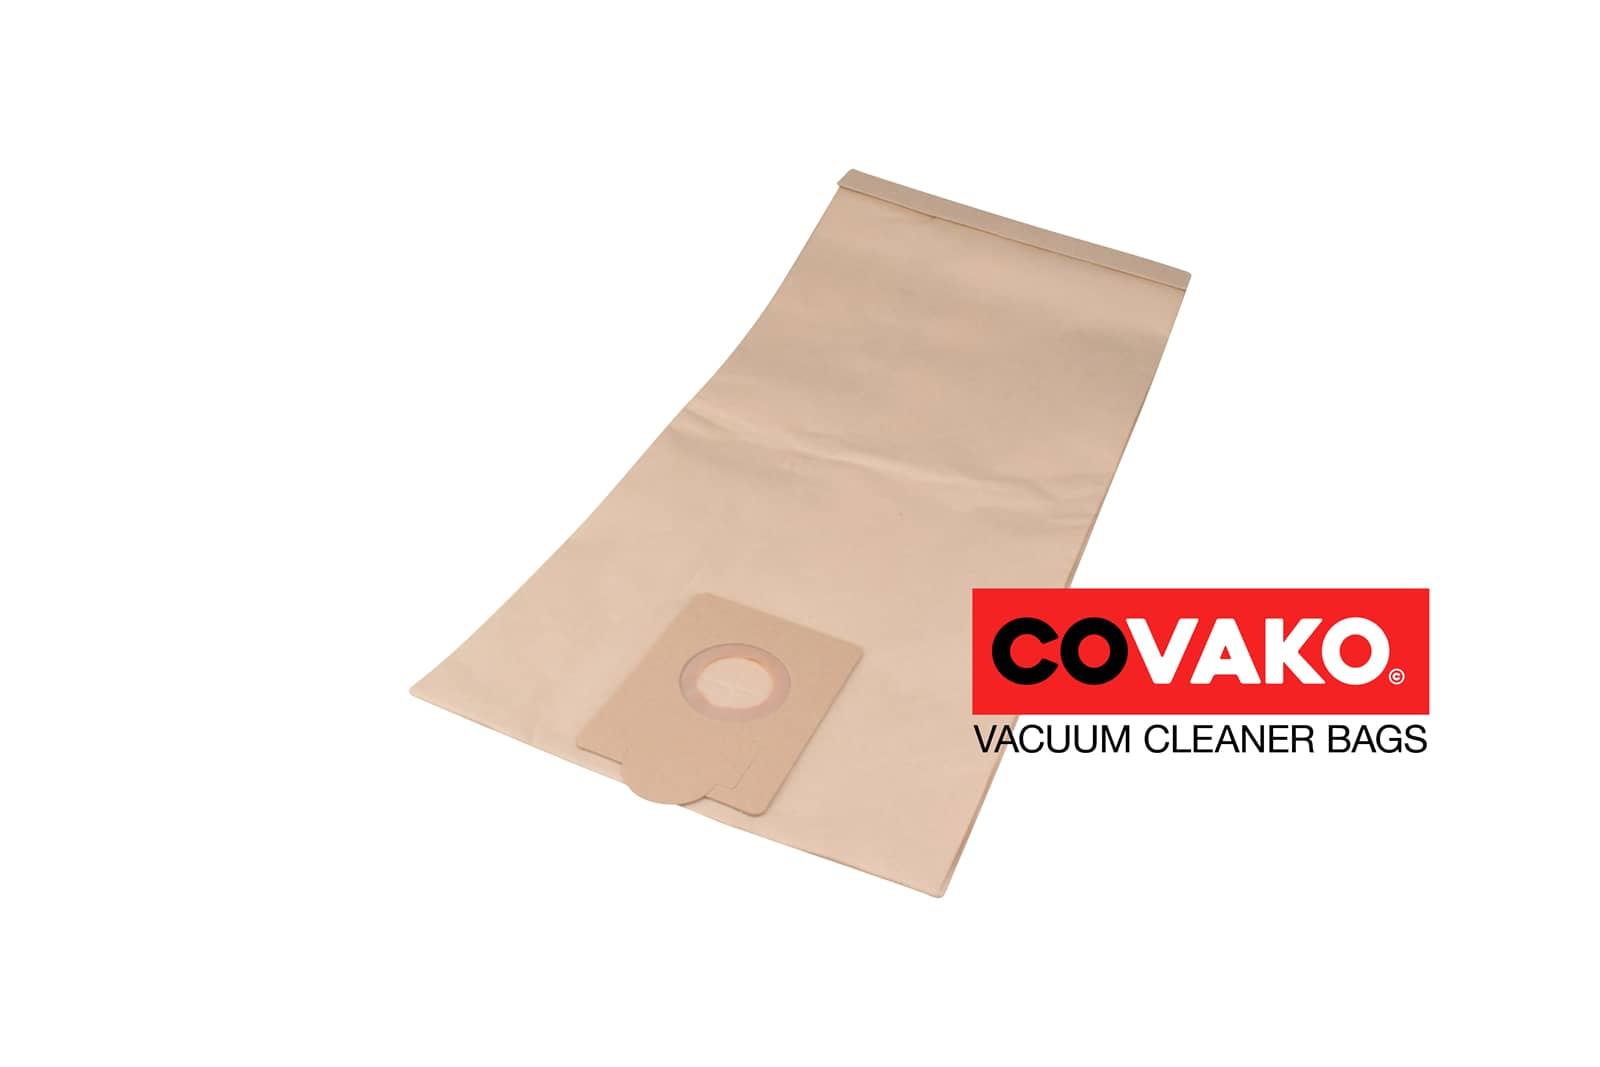 Hako Supervac 290 / Papier - Hako Staubsaugerbeutel